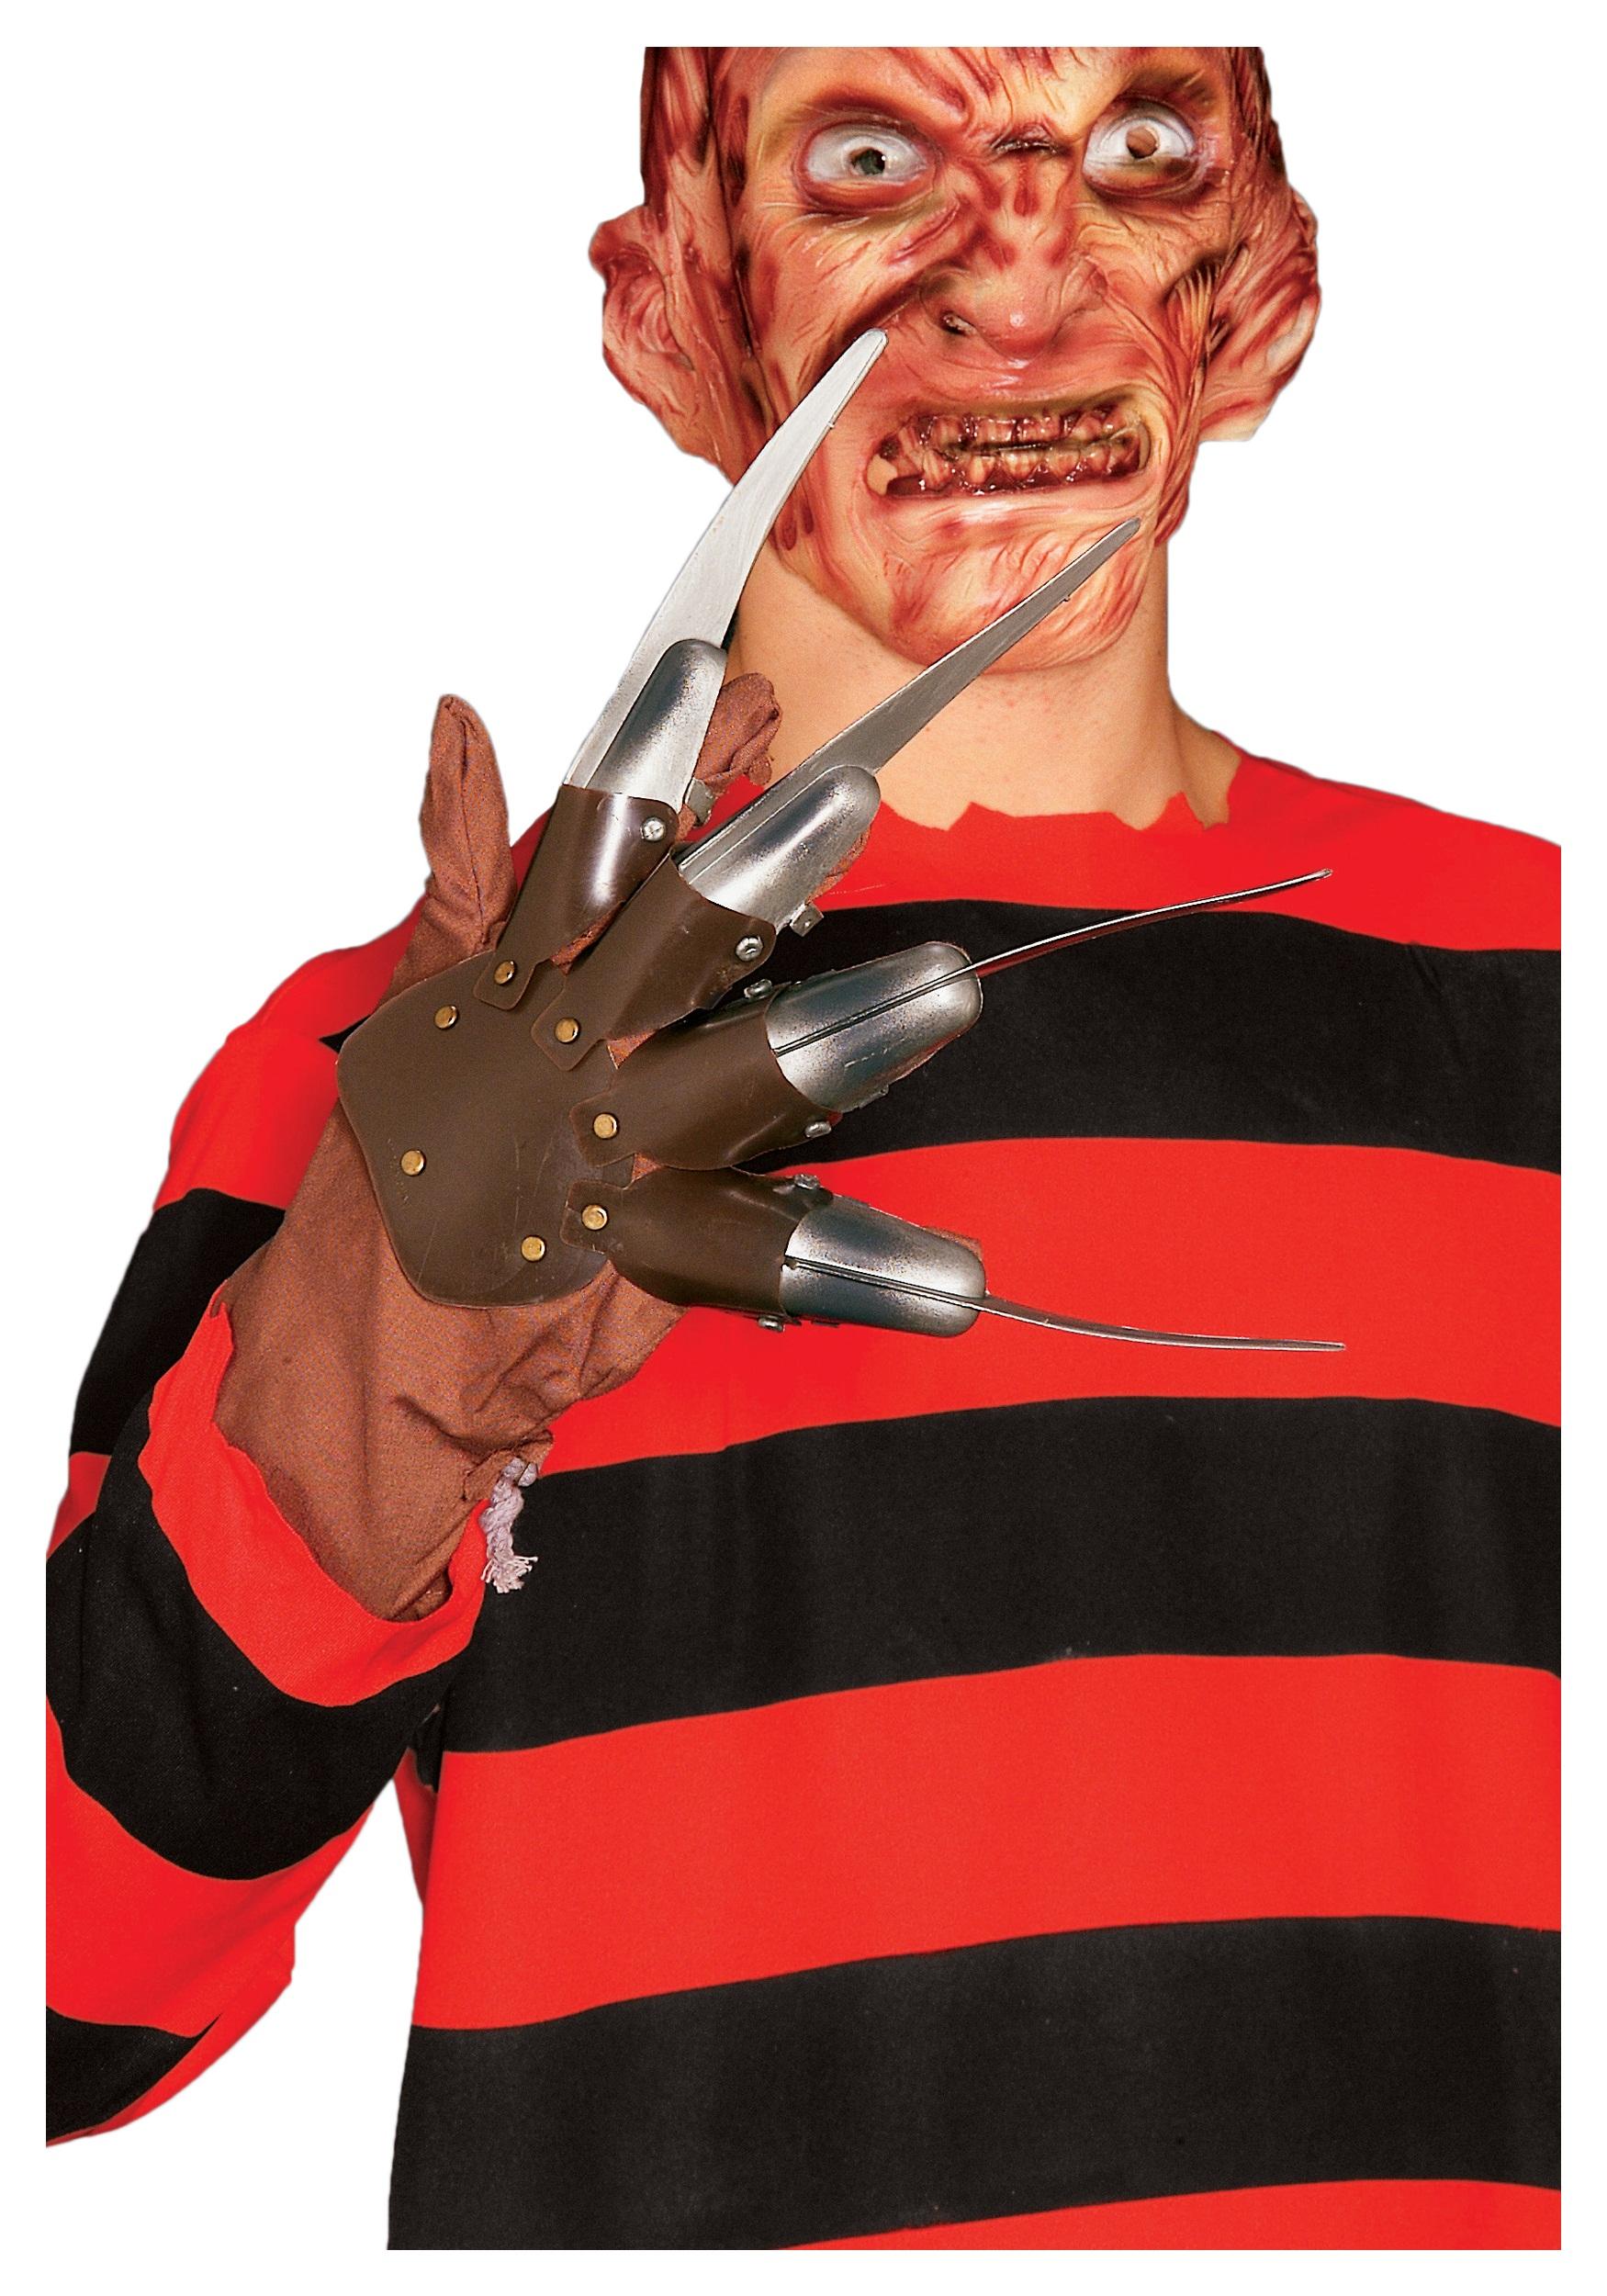 Freddy Krueger Glove RU1231